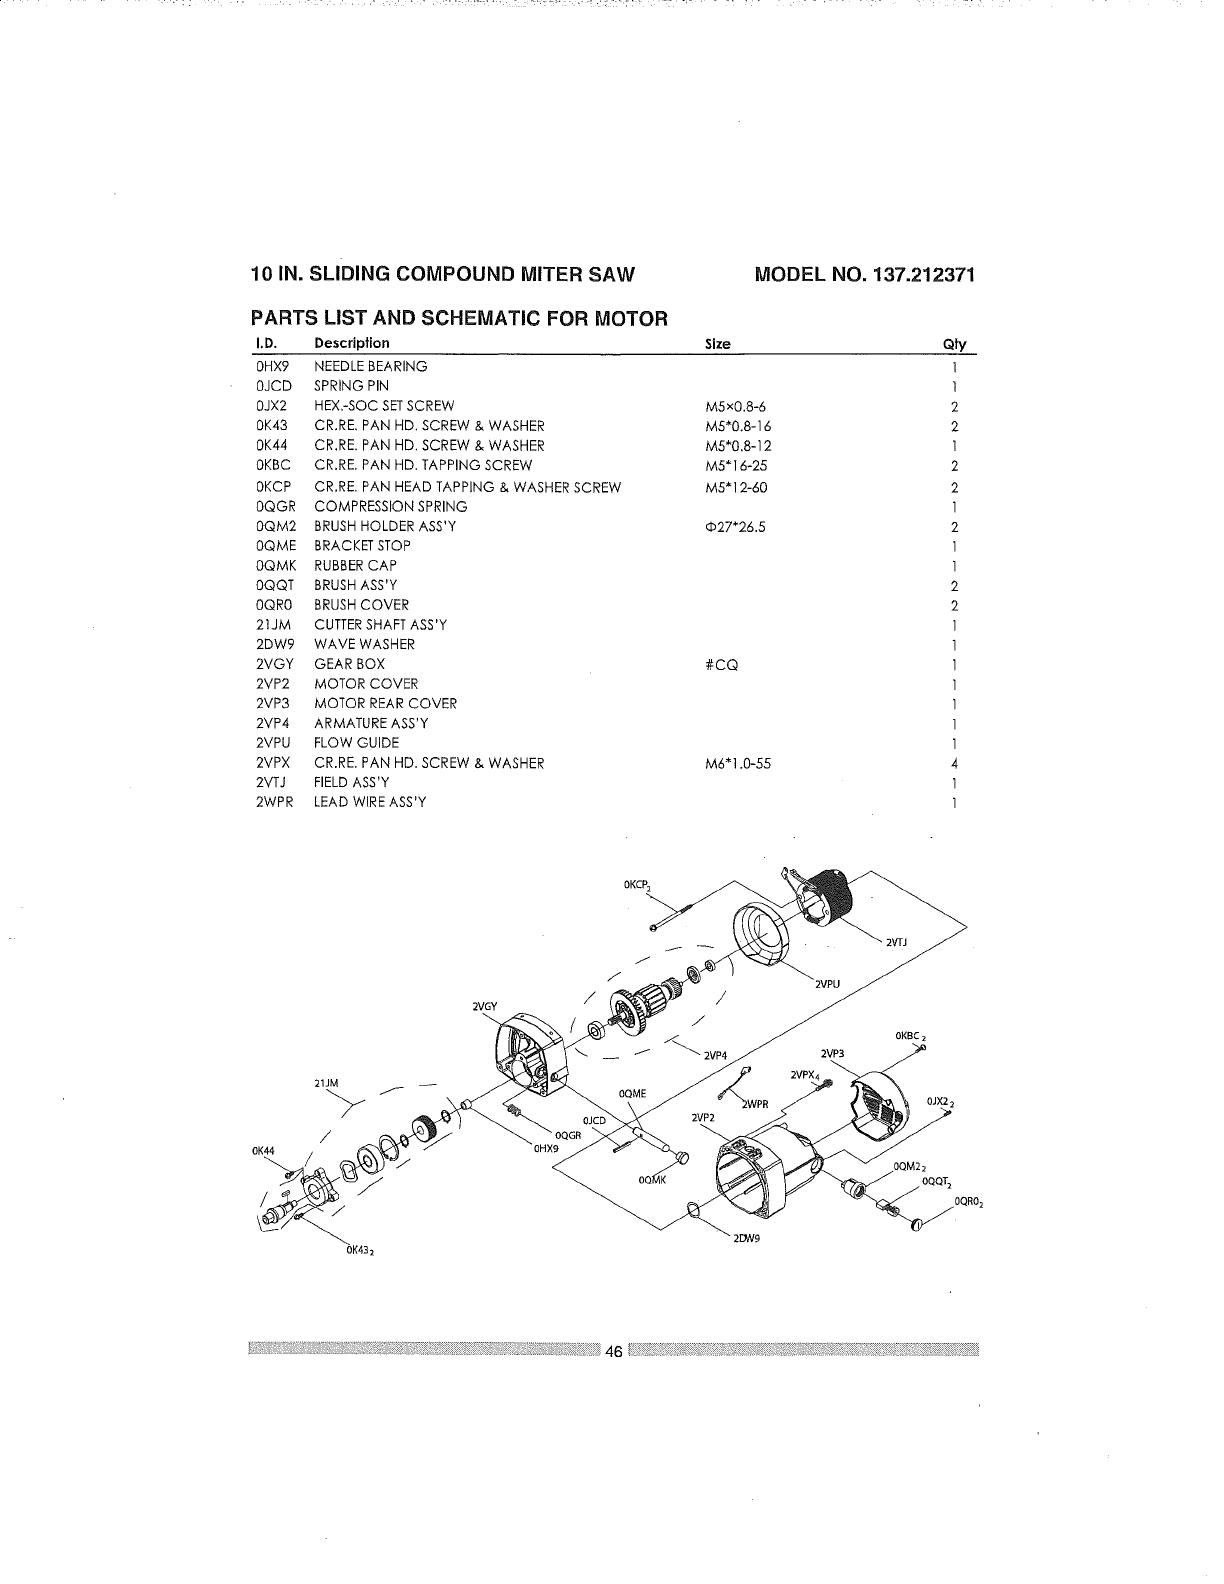 Craftsman 137212371 User Manual MITER SAW Manuals And